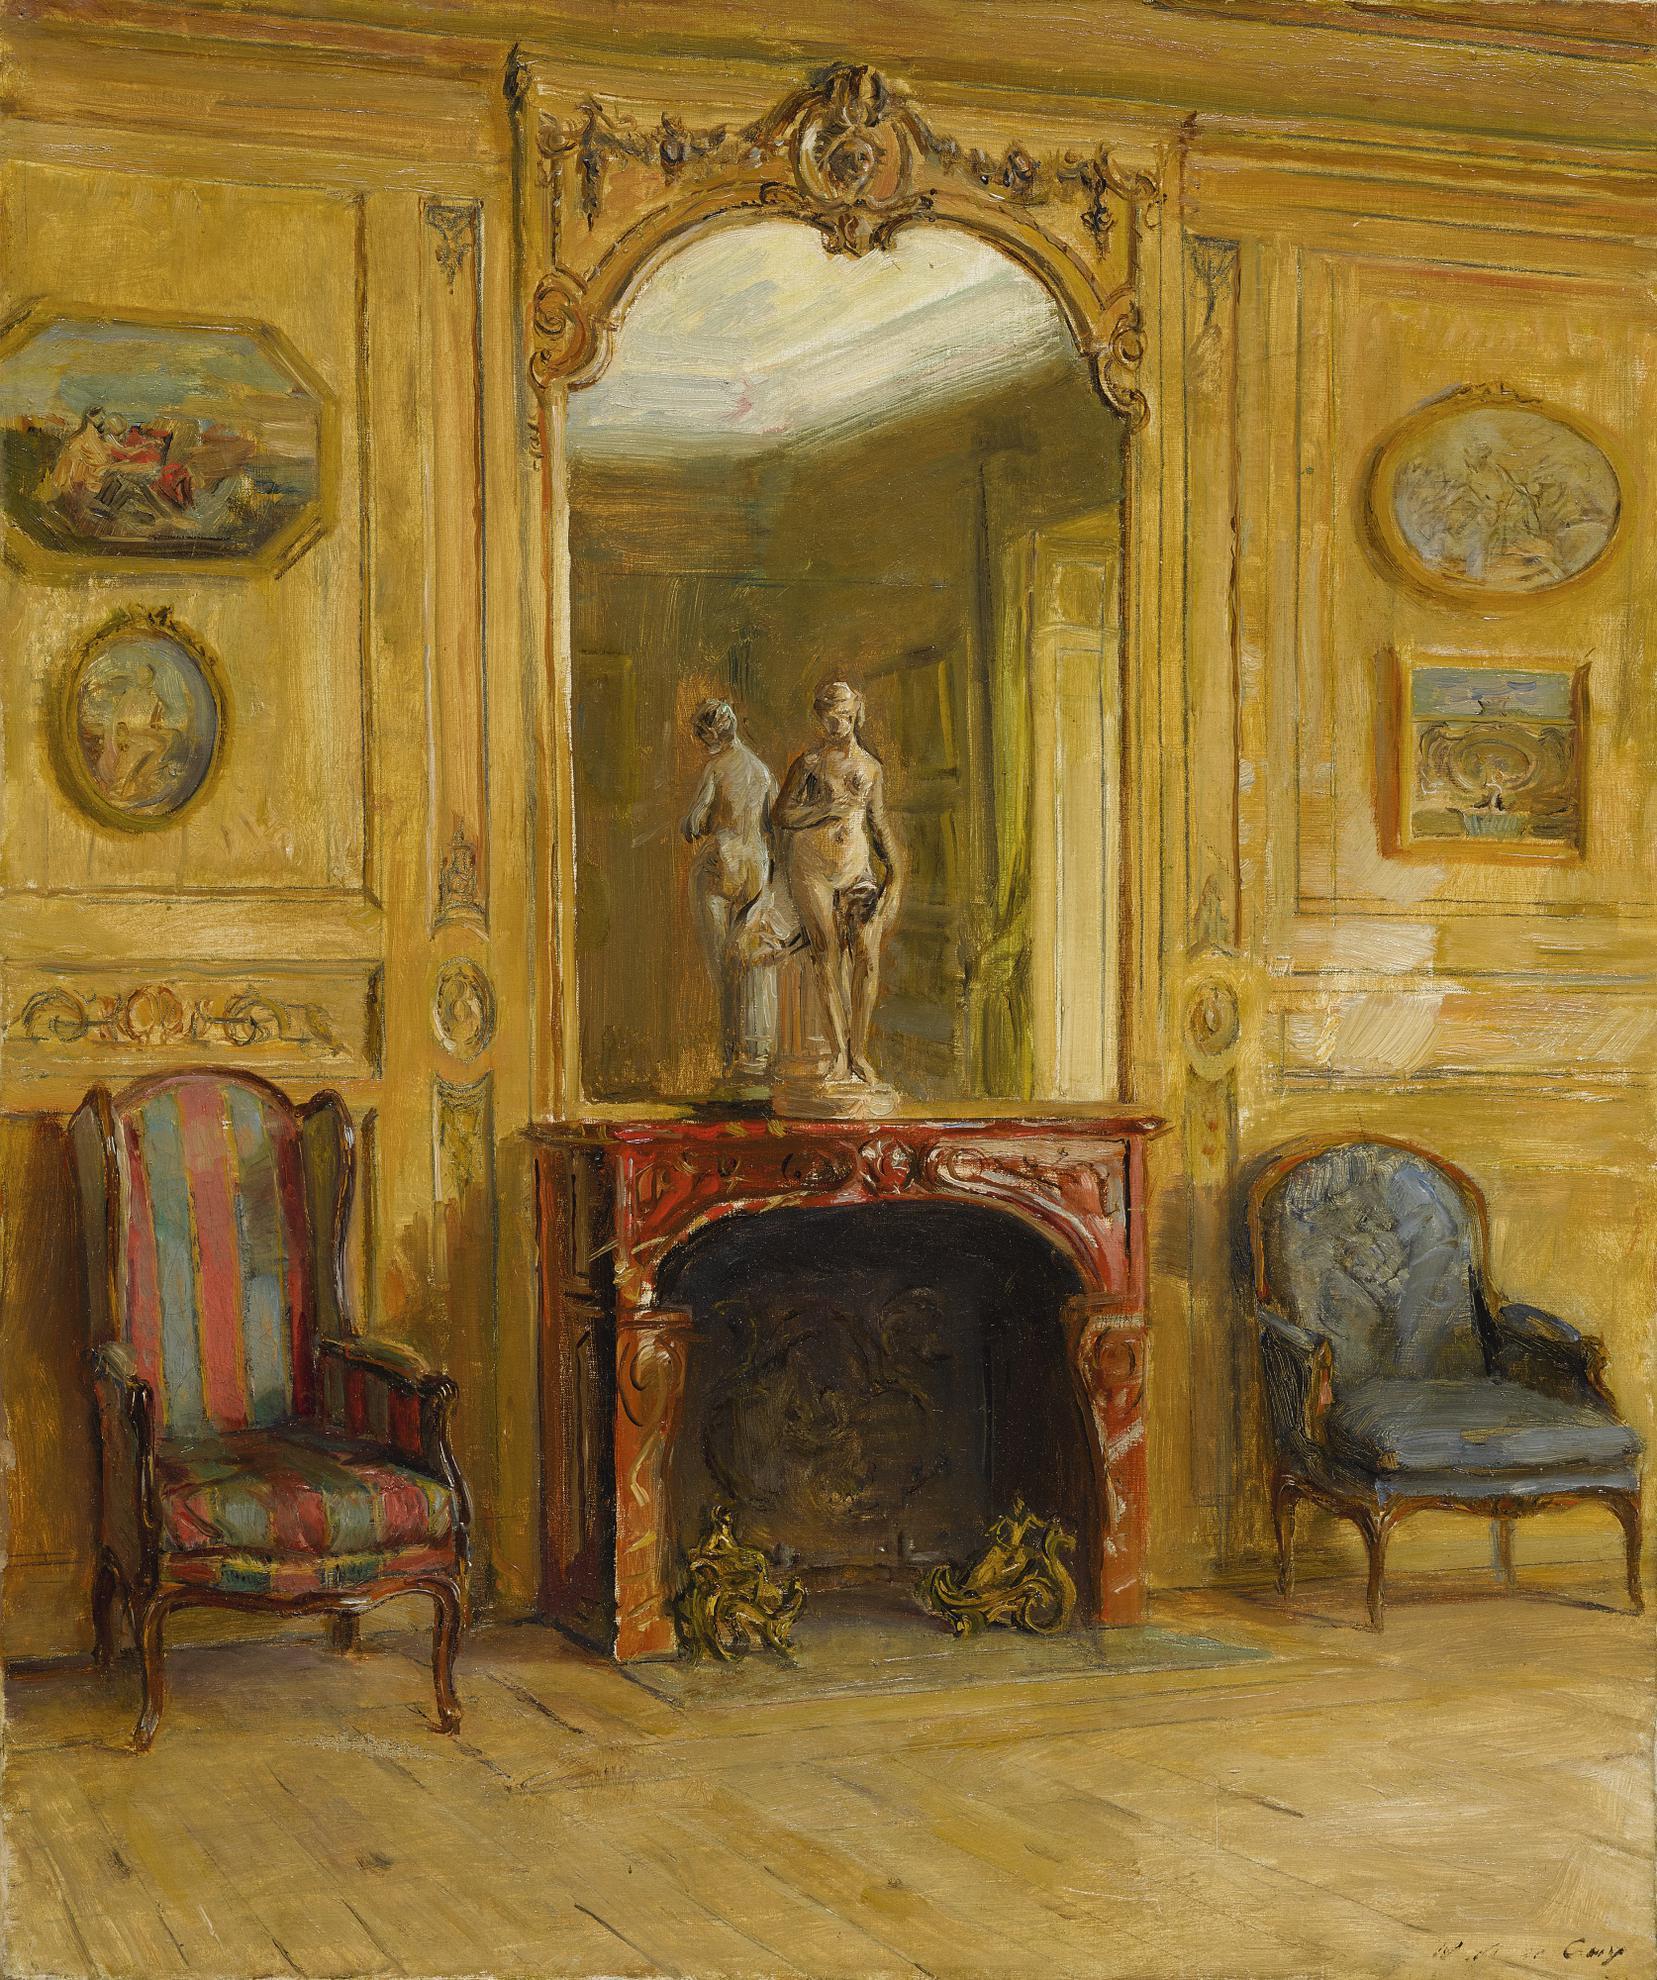 Walter Gay - French Salon-